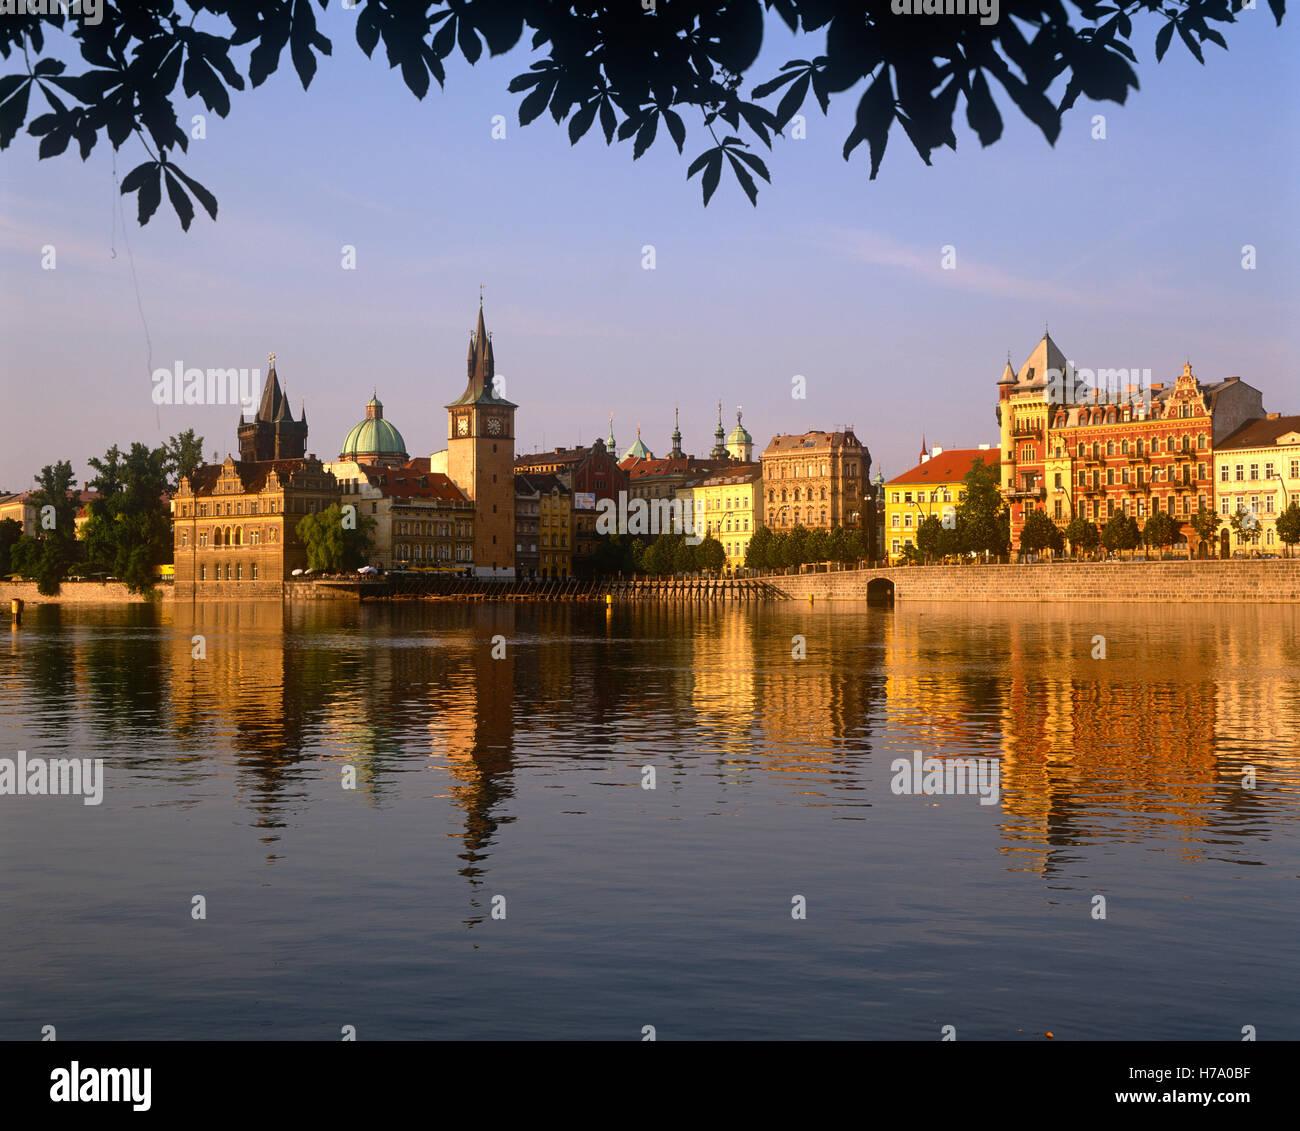 Stare Mesto reflecting in the River Vltava, Prague, Czech Republic - Stock Image